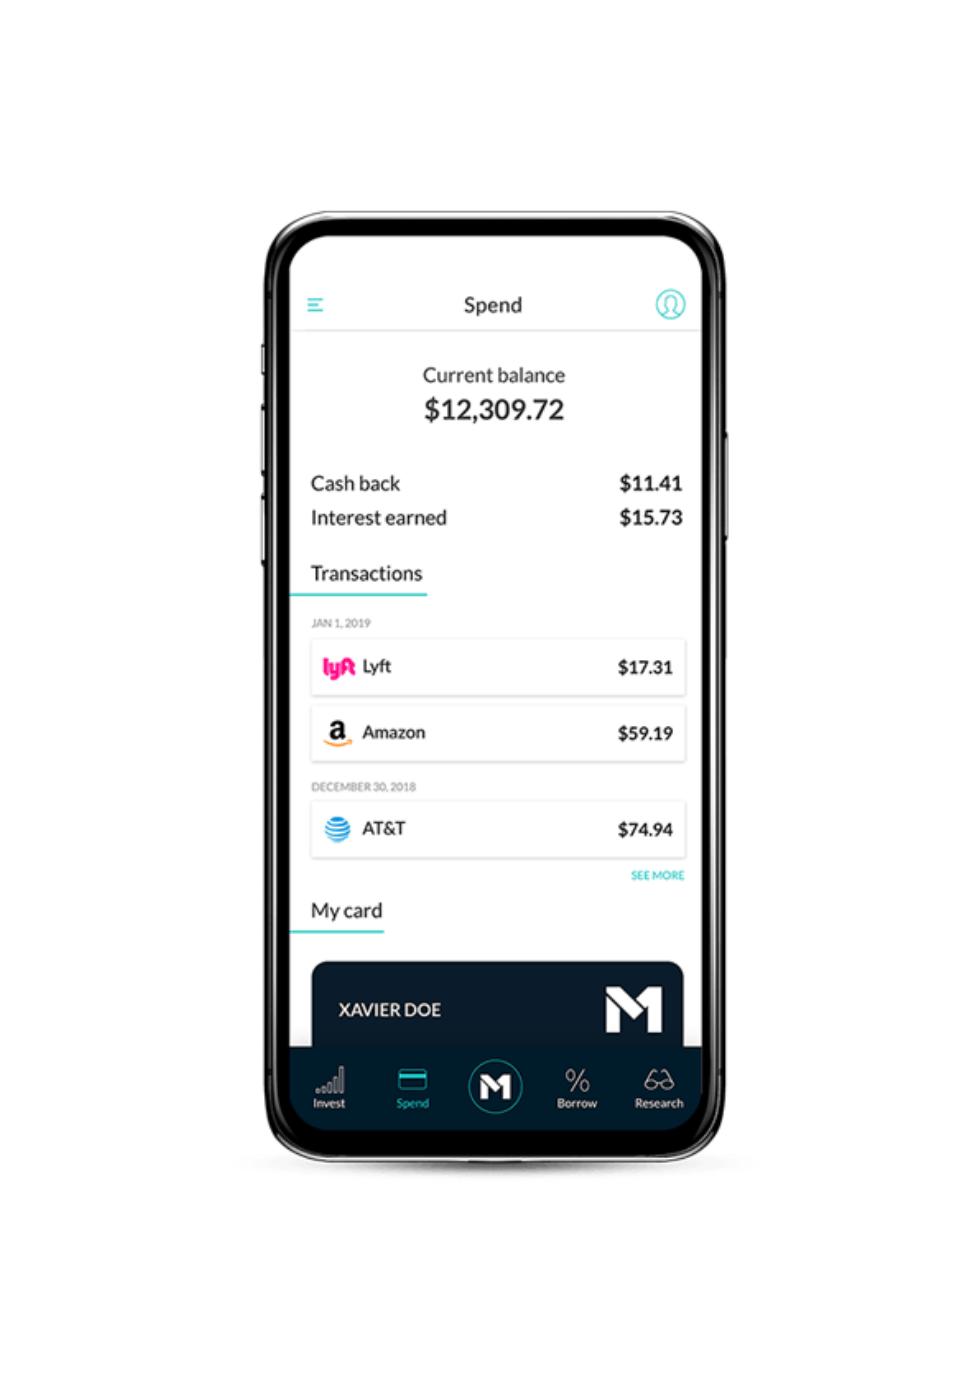 M1 Finance Plus App Screen Phone iPhone 1% cash back